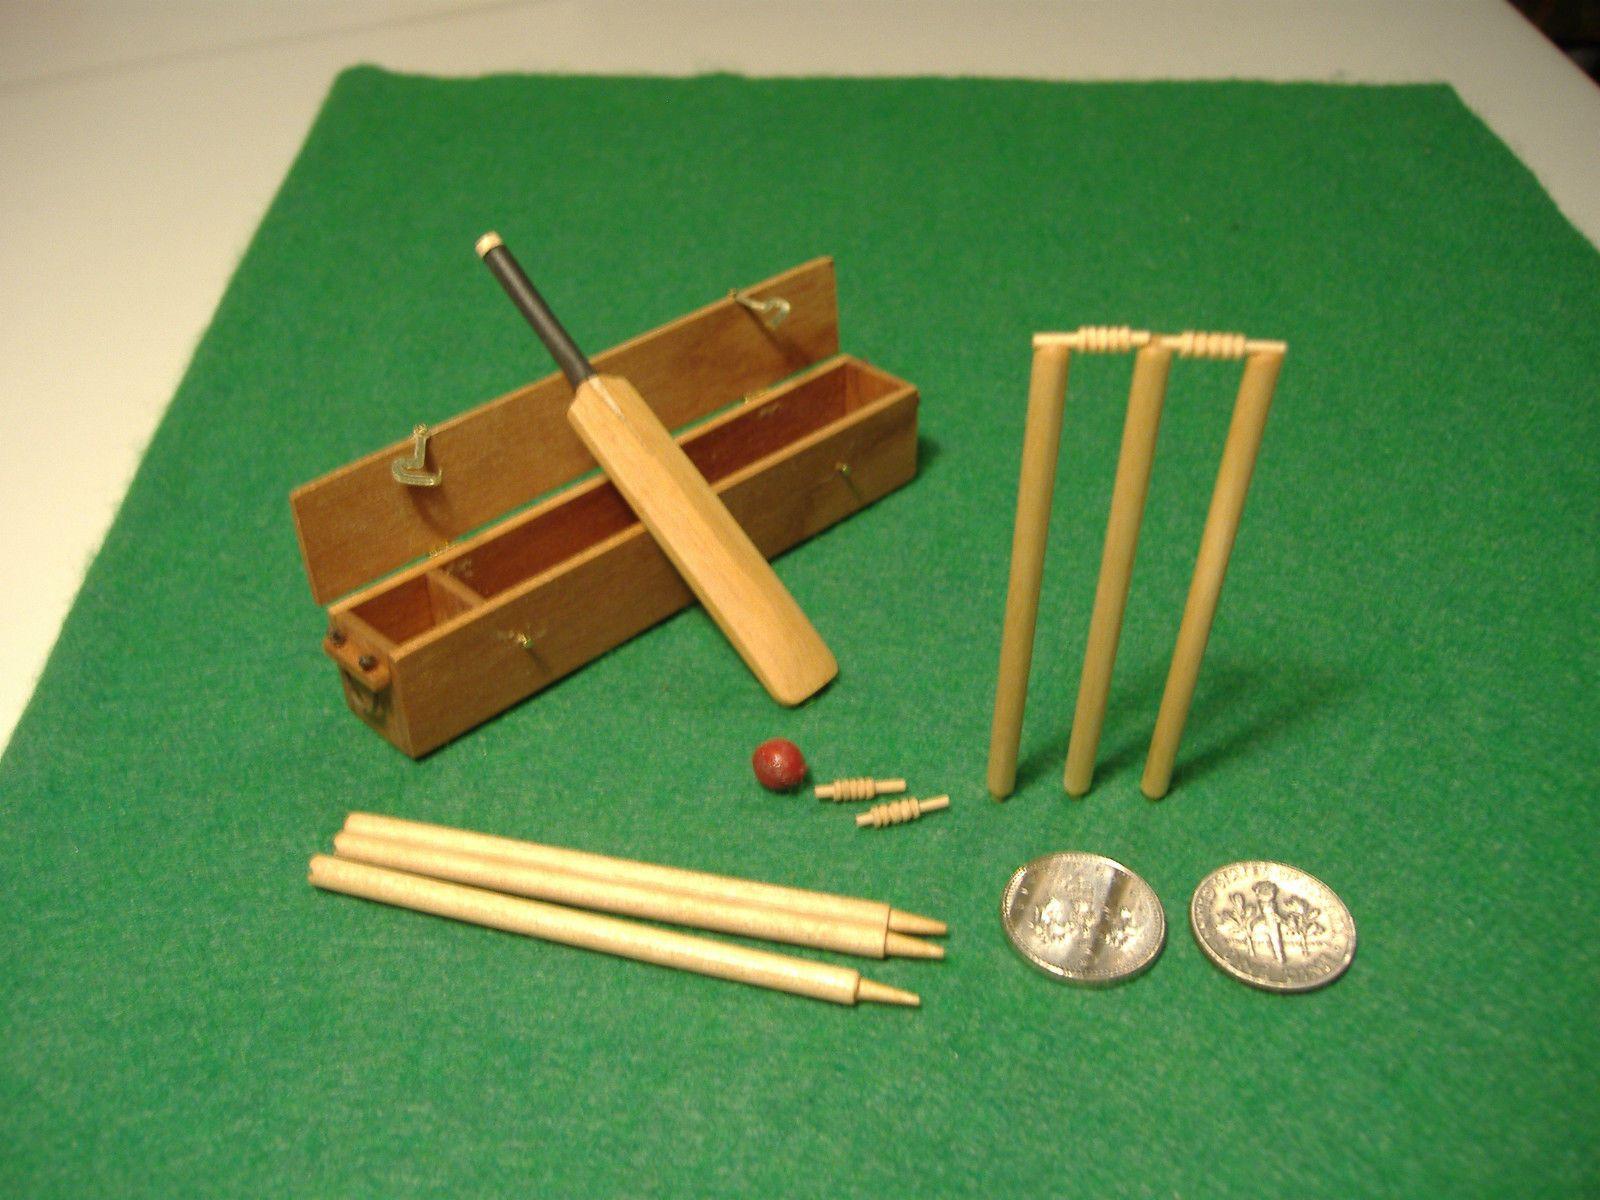 Dolls house miniature 1/12th scale Cricket set | eBay & Dolls house miniature 1/12th scale Cricket set | eBay | Miniatures ...